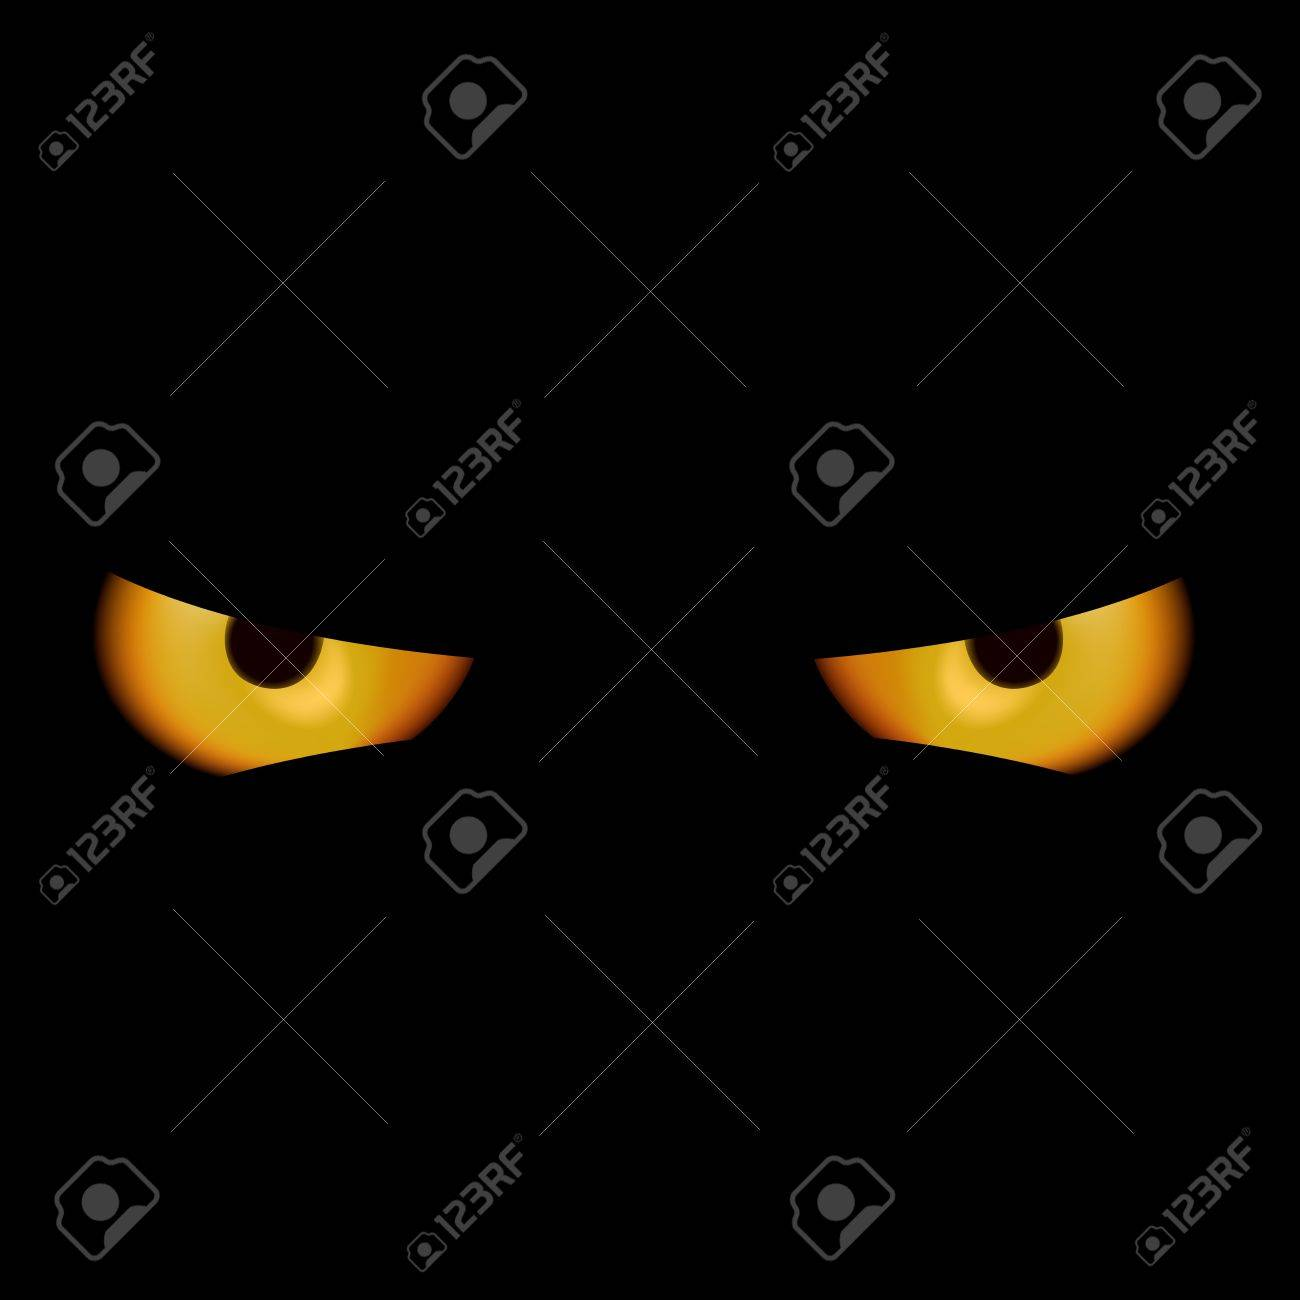 Devil Eyes - Spooky Background Illustration Stock Vector - 15651766